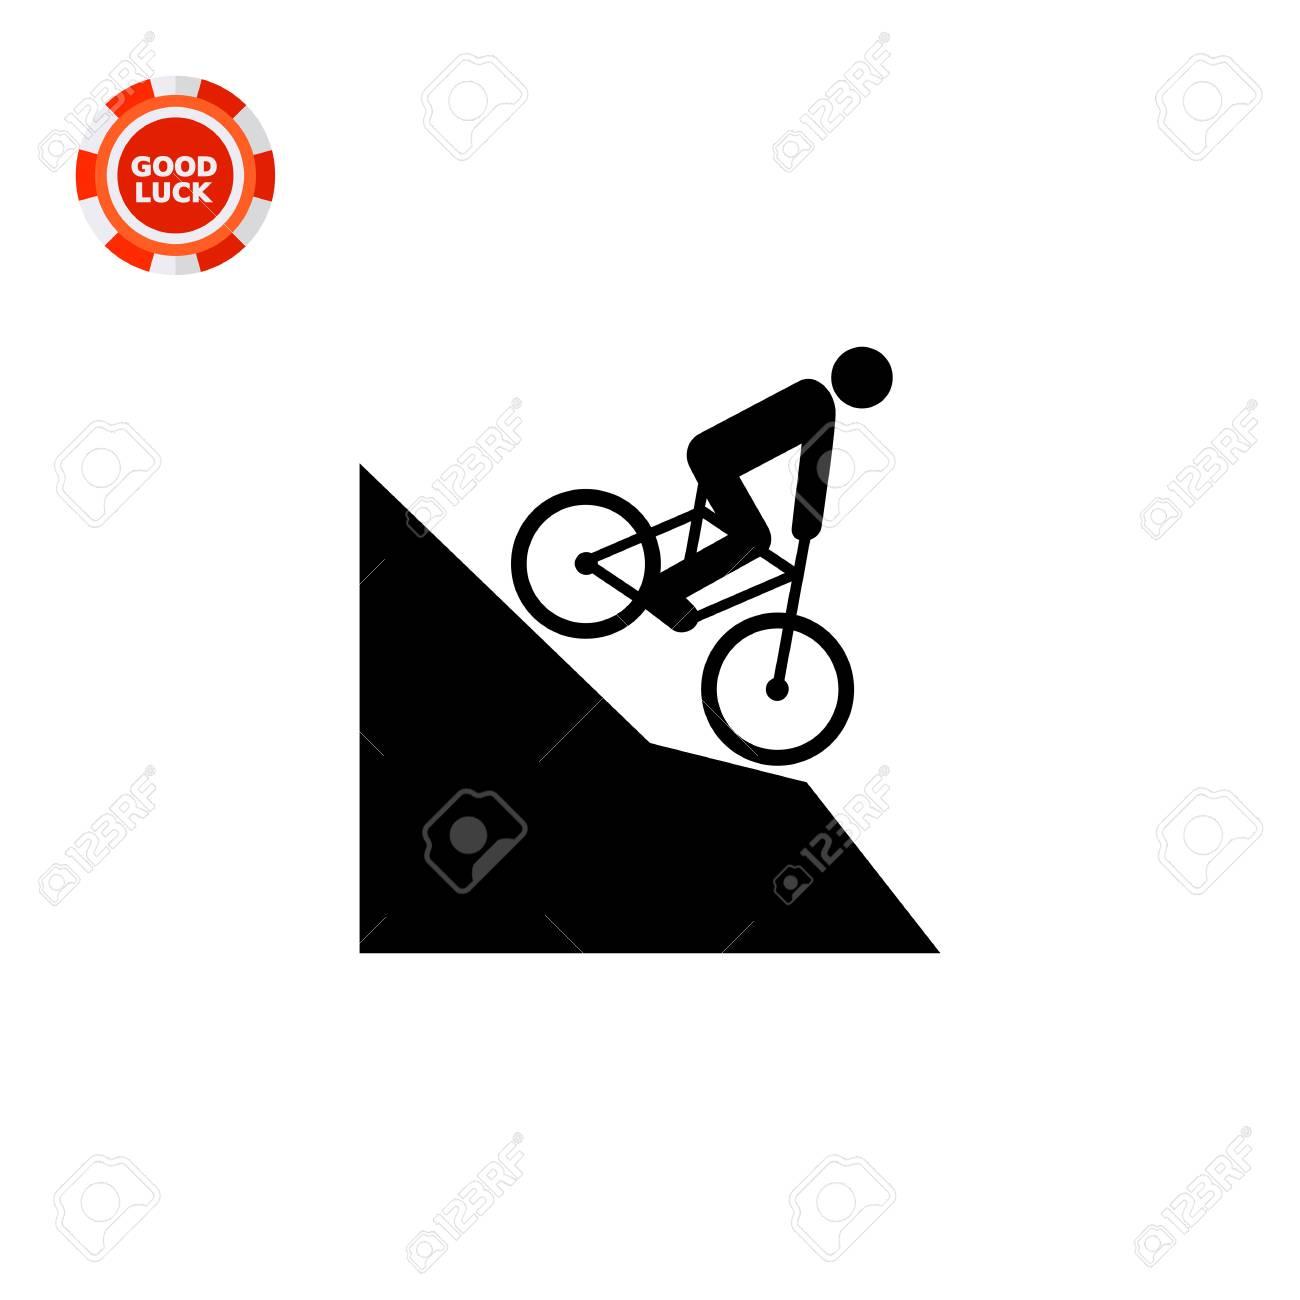 Man Riding Mountain Bike Downhill Extreme Fast Fun Mountain